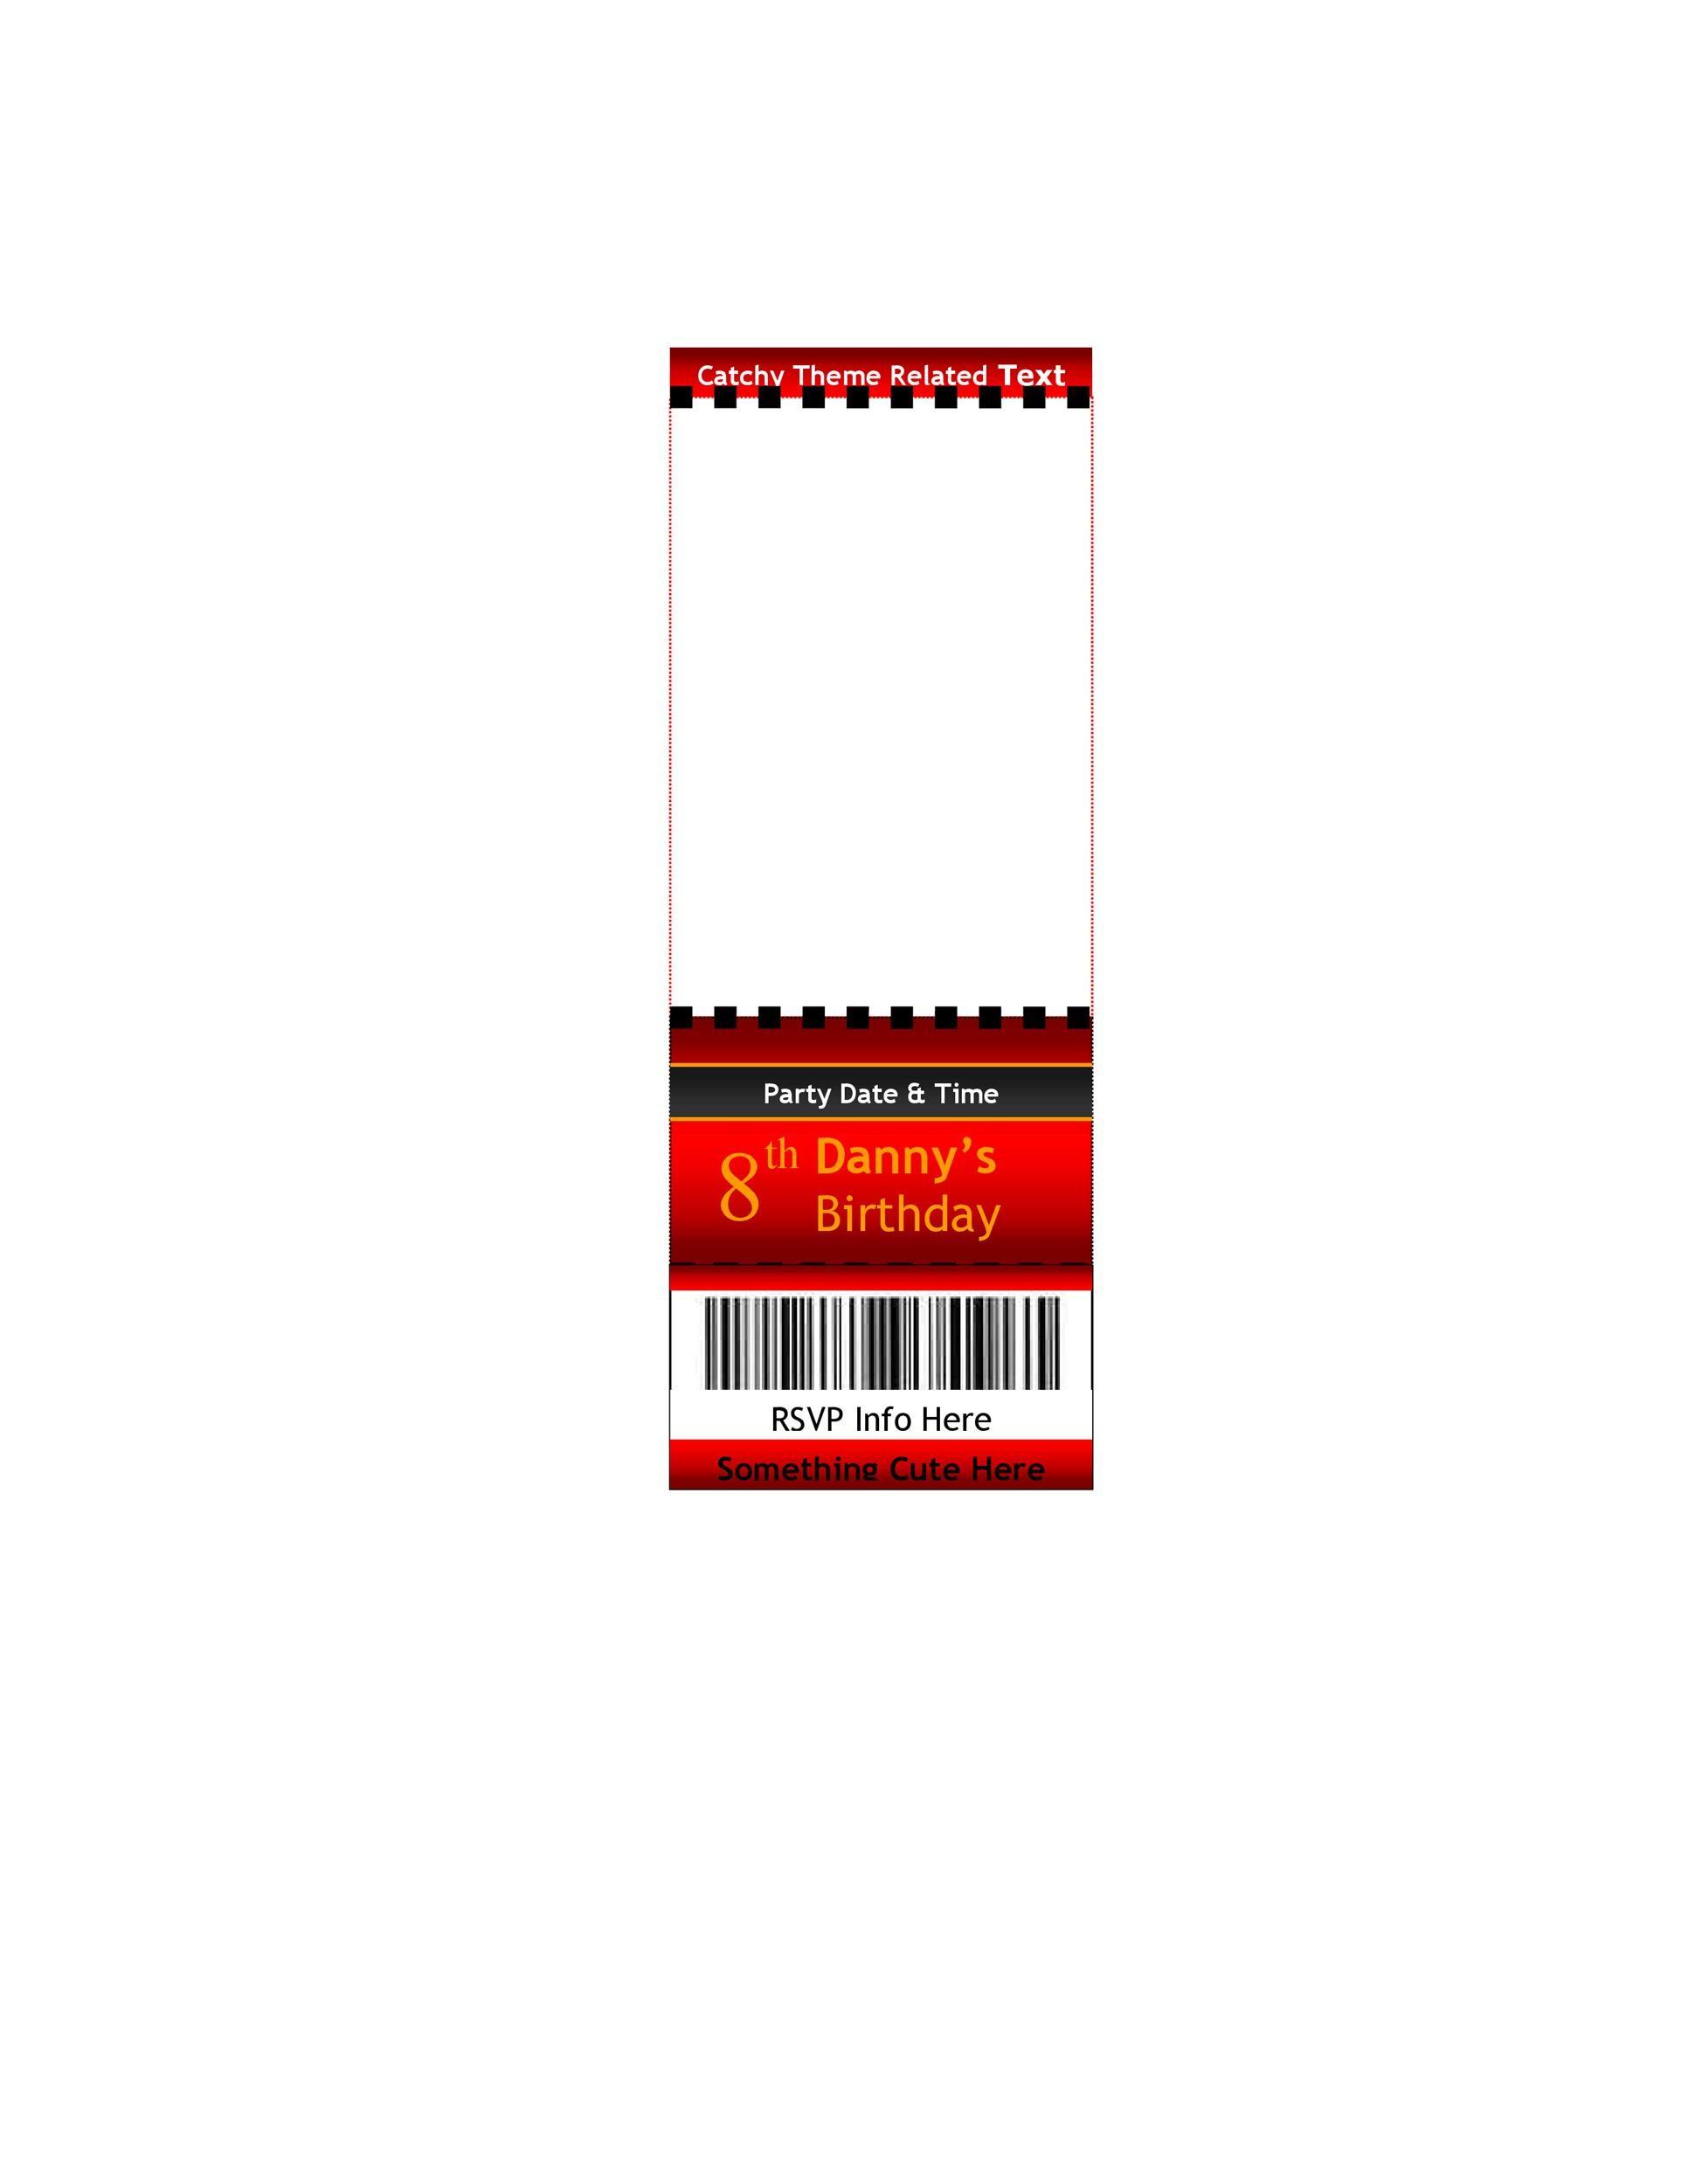 Free Raffle Ticket Templates 35